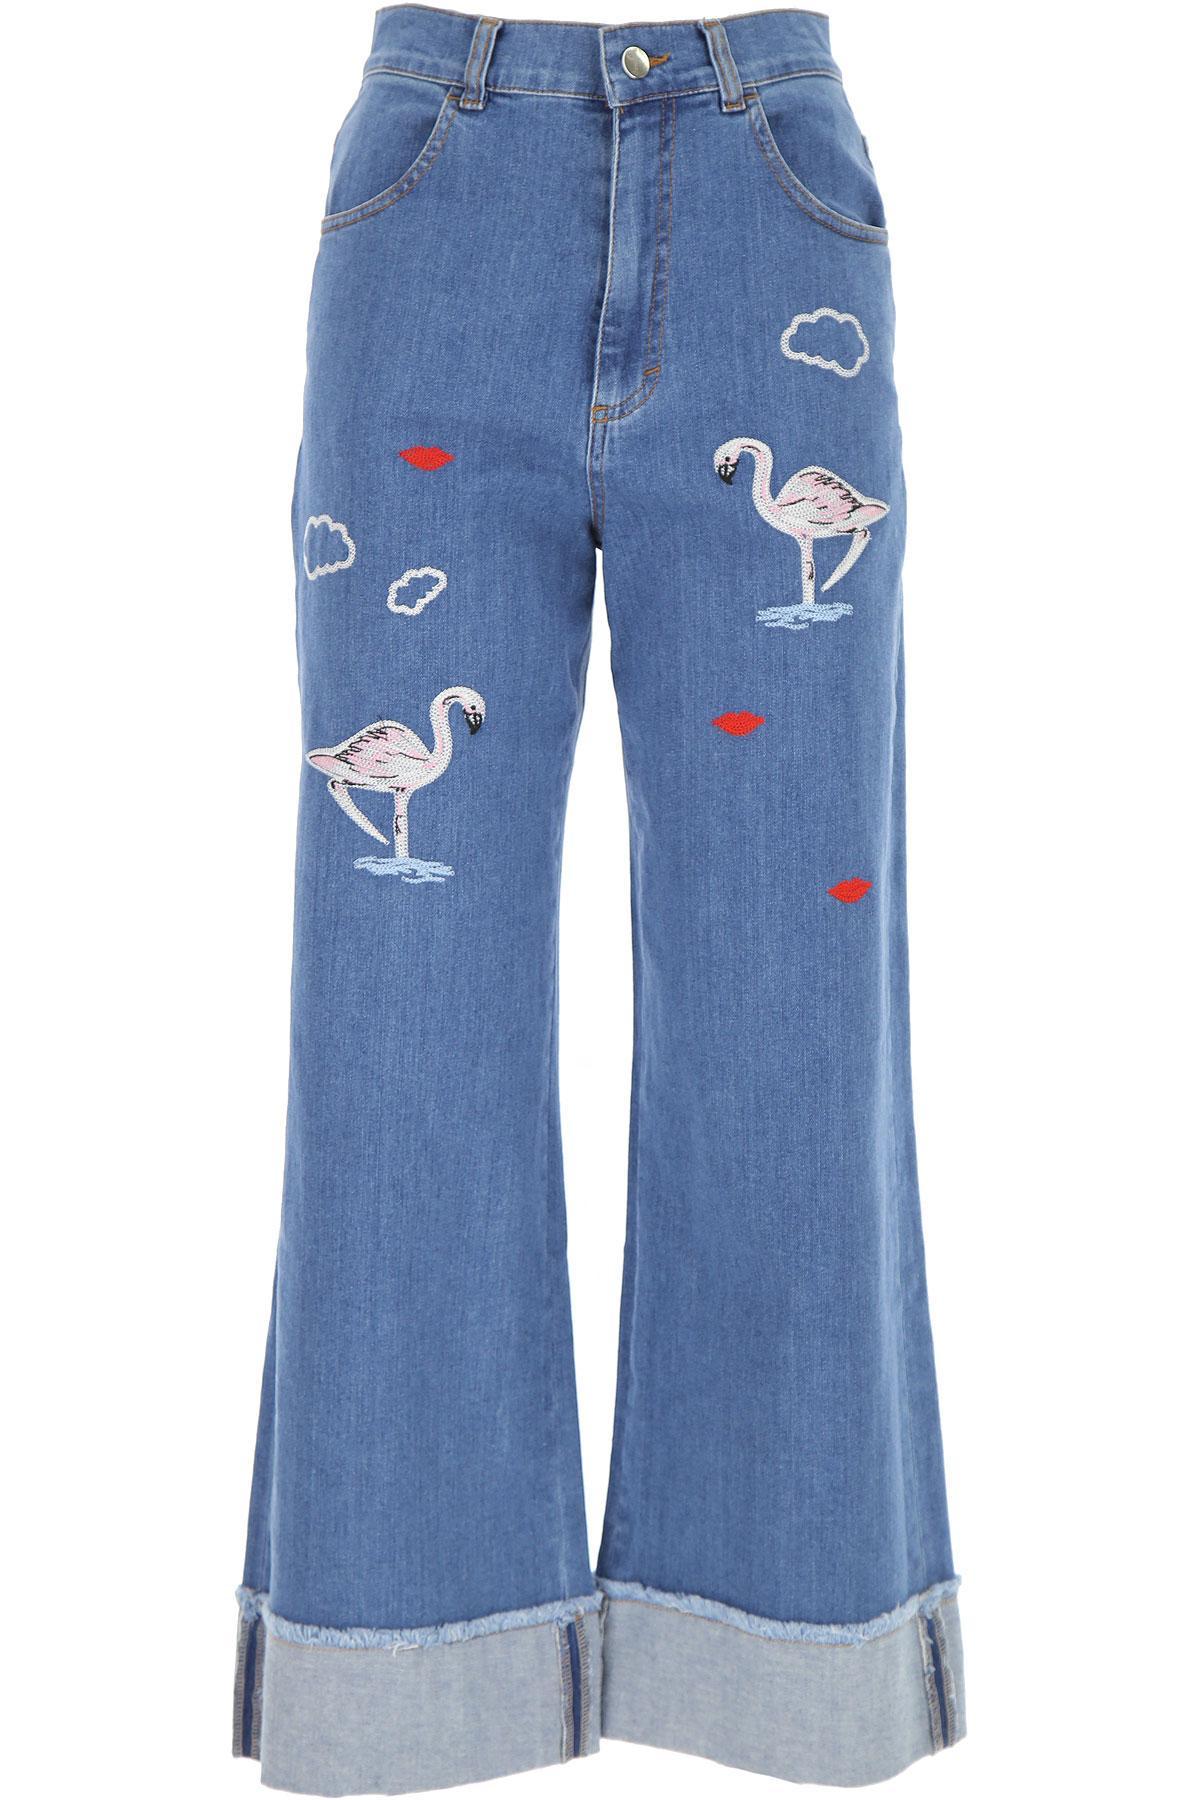 2791494ce8 Lyst - Vivetta Jeans in Blue